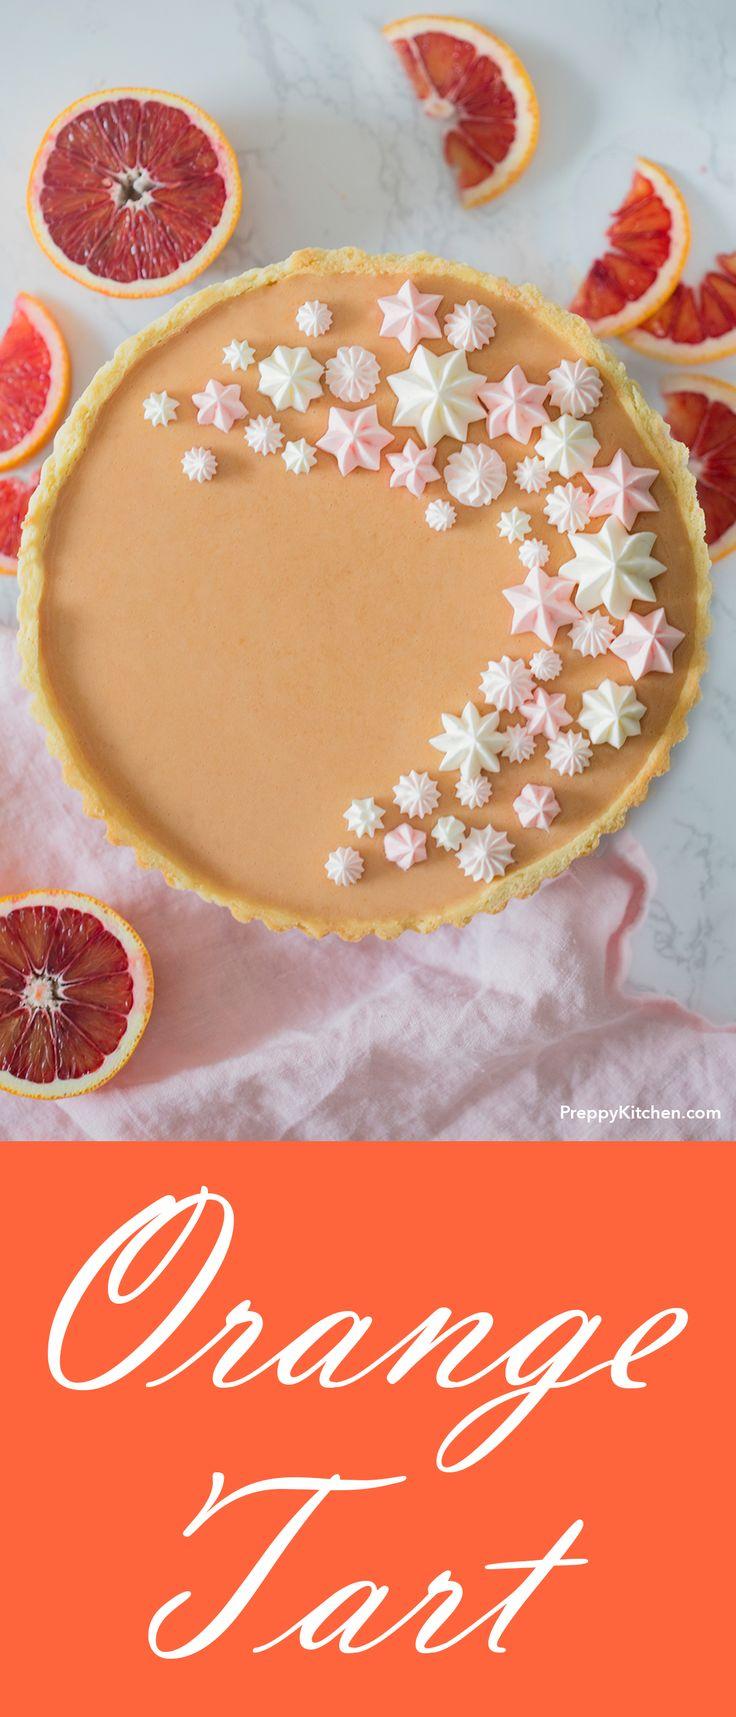 Homemade Blood Orange Tart with delicate Swiss buttercream dollops - Pies and tarts, fruit tarts, blood orange desserts, easy desserts #desserts #recipes, #bloodorange #tart #sweets #orange #mothersday #brunch #comfortfood